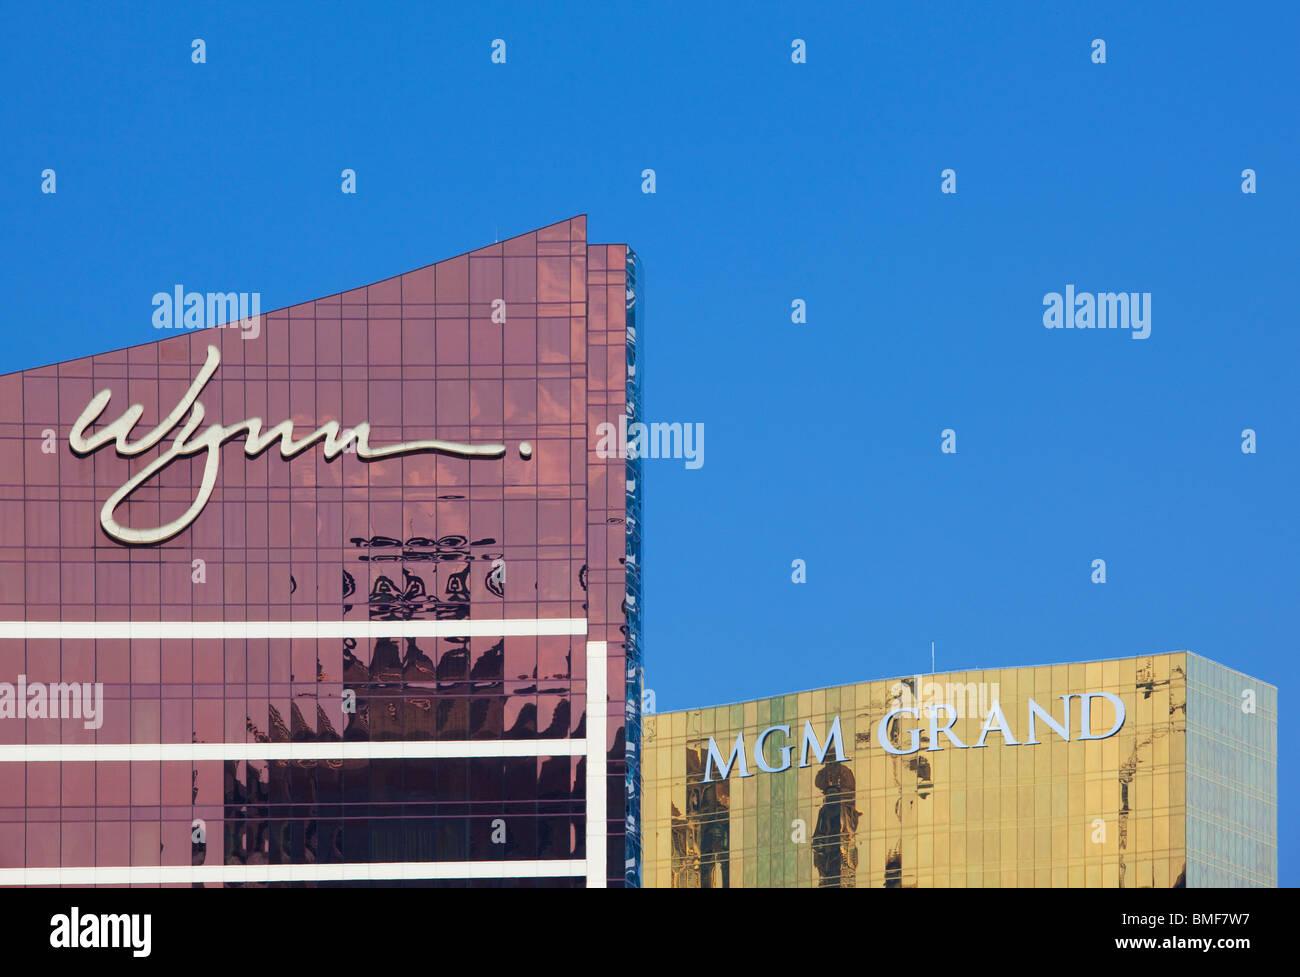 Wynn and MGM casinos; Macau; China - Stock Image